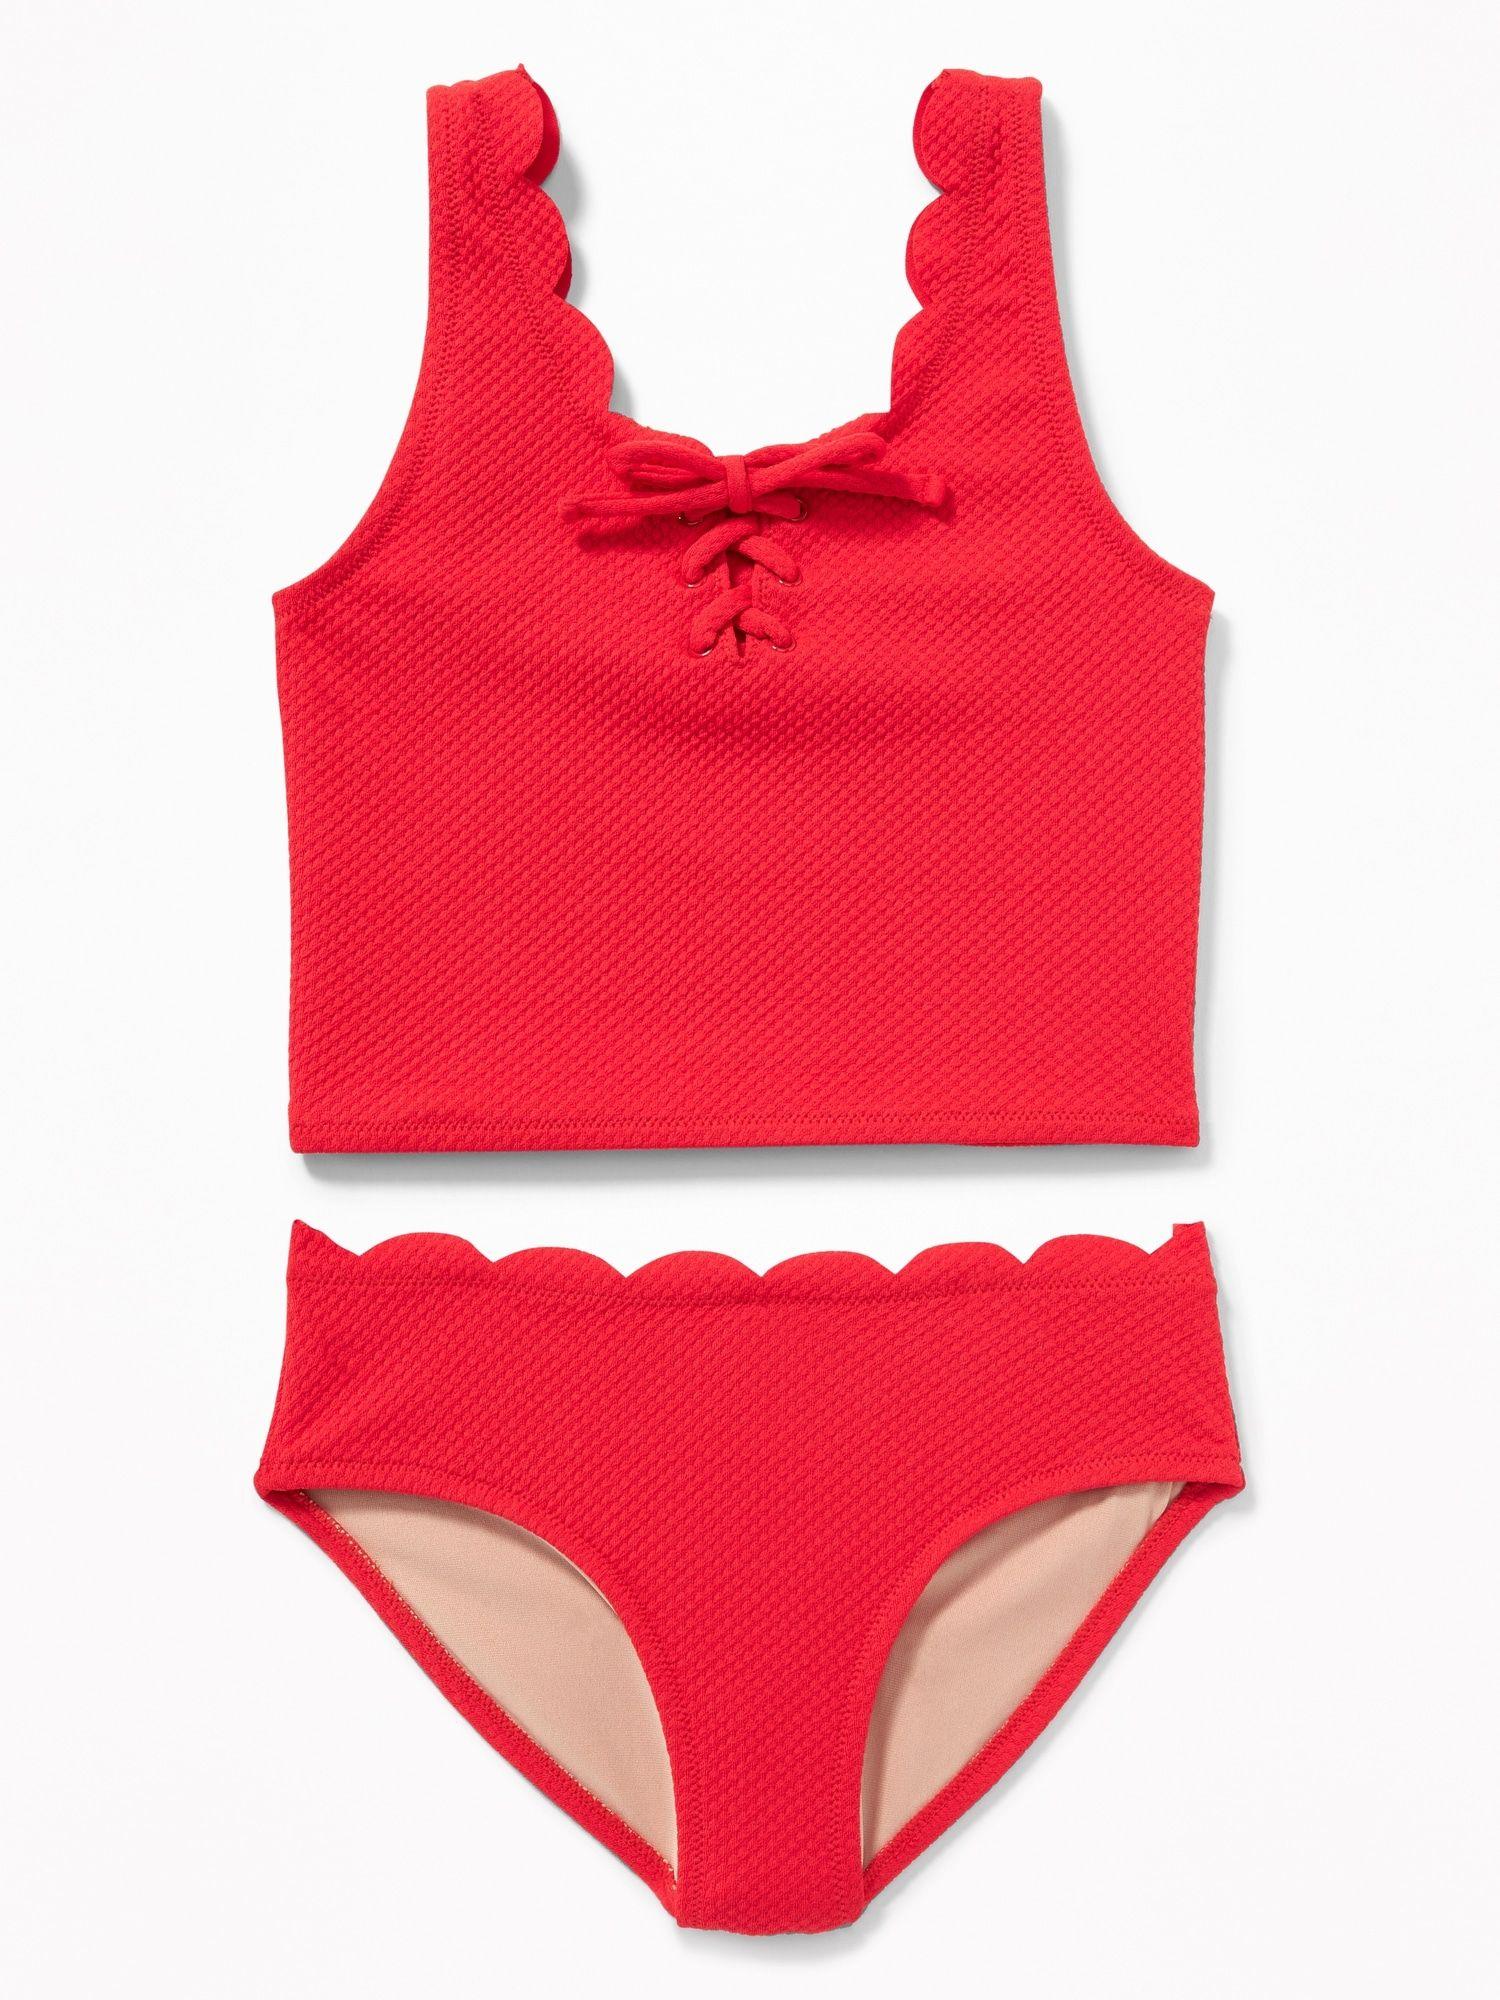 a83ac17976f4e product Swim Sets, Kids Swimming, Jacquard Fabric, Swim Bottoms, Tankini Top ,